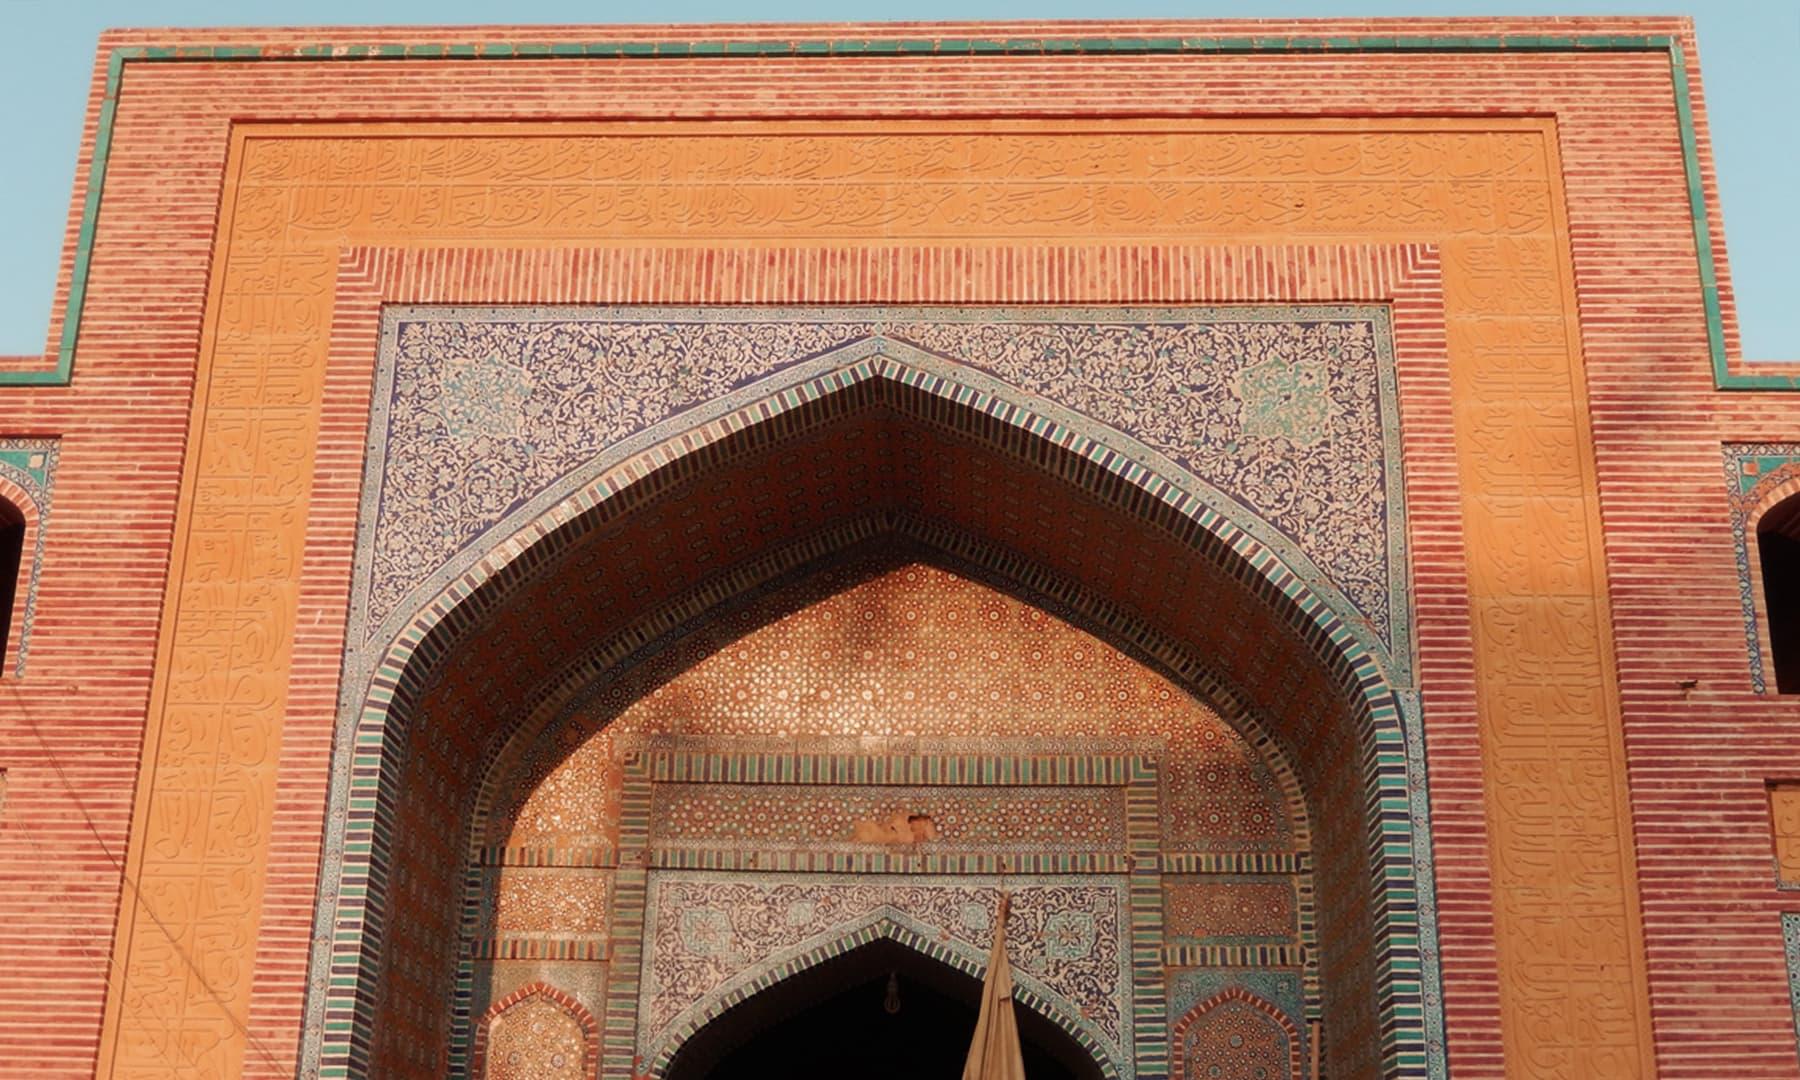 جامع مسجد ٹھٹھہ — تصویر ابوبکر شیخ